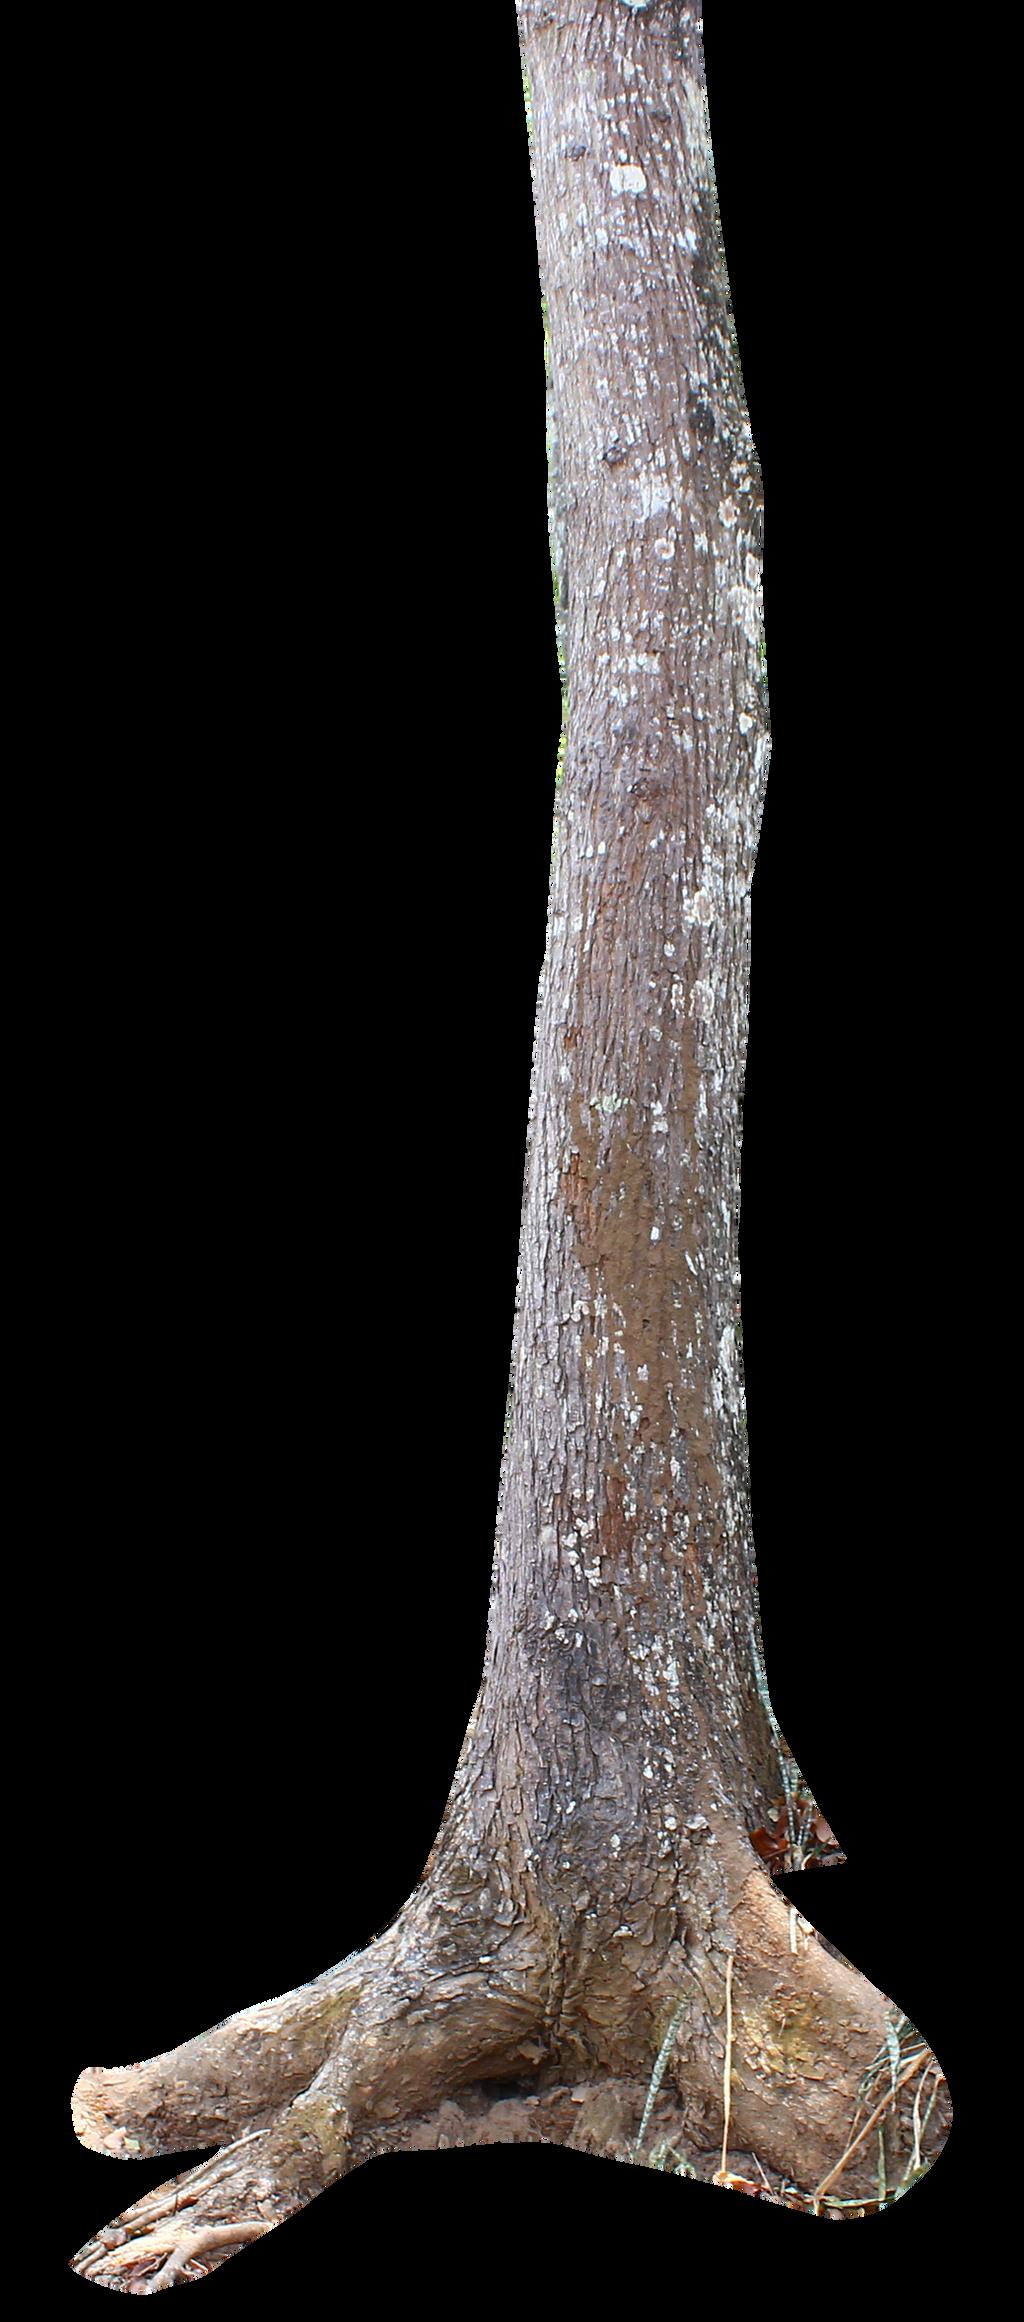 tree trunk png by andhikazanuar